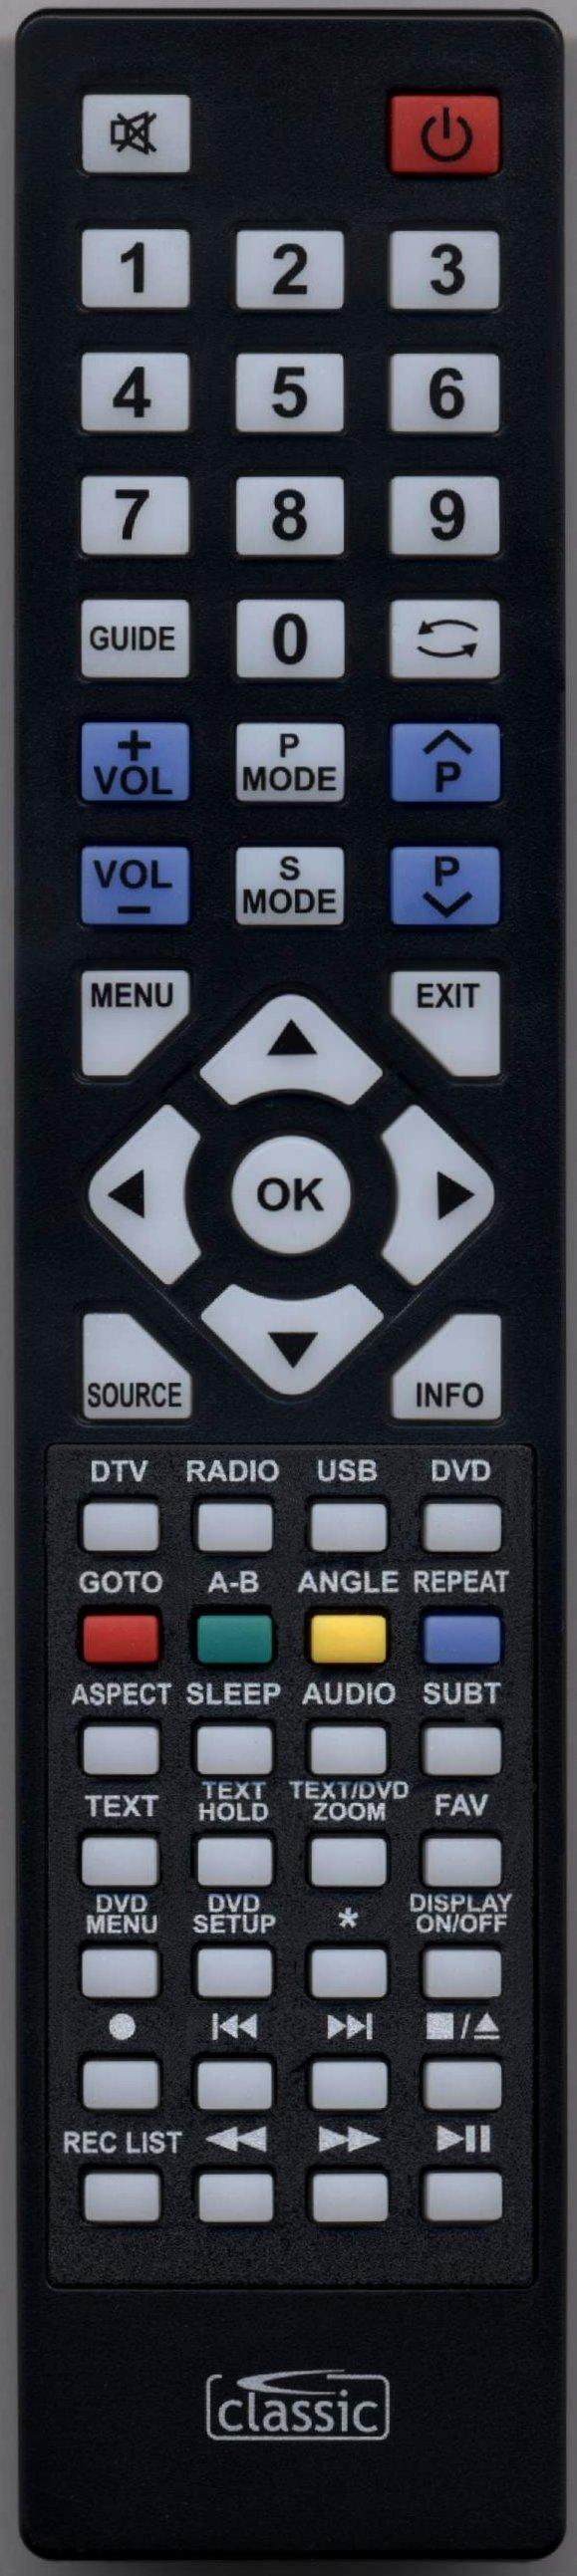 Blaupunkt 321480GB11BEGPUK Remote Control